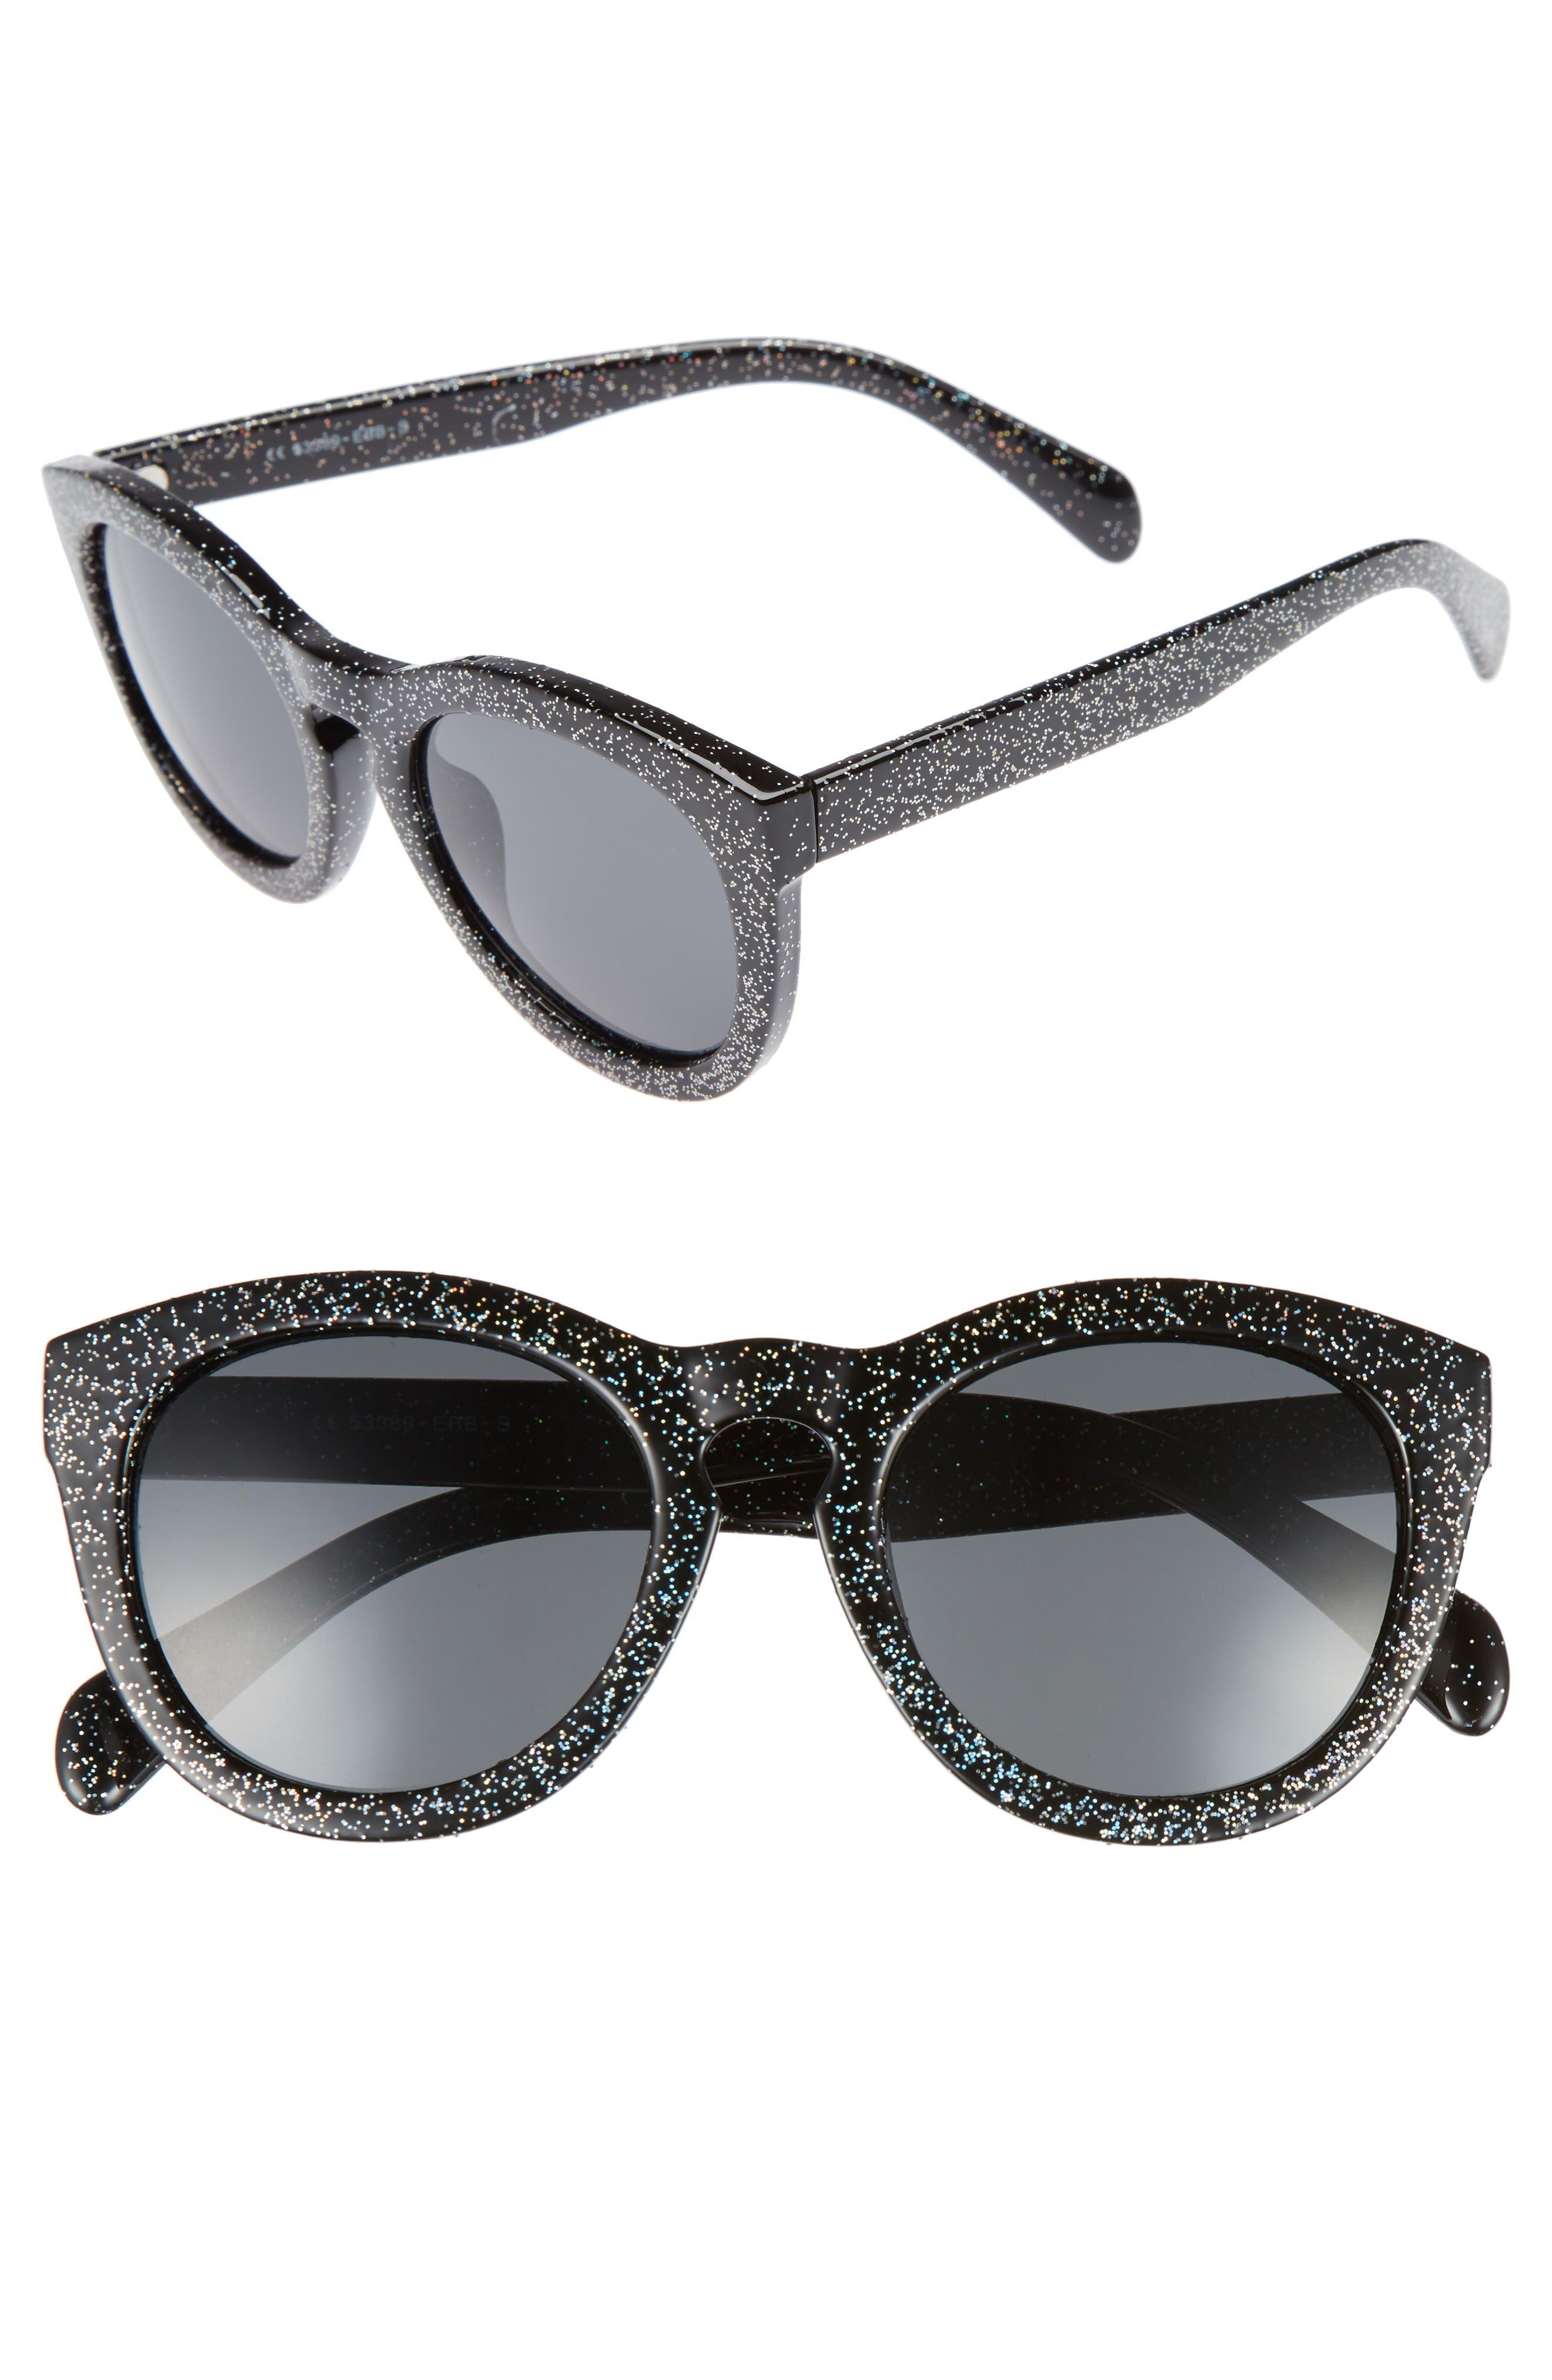 50mm Glitter Round Sunglasses,                             Main thumbnail 1, color,                             Black